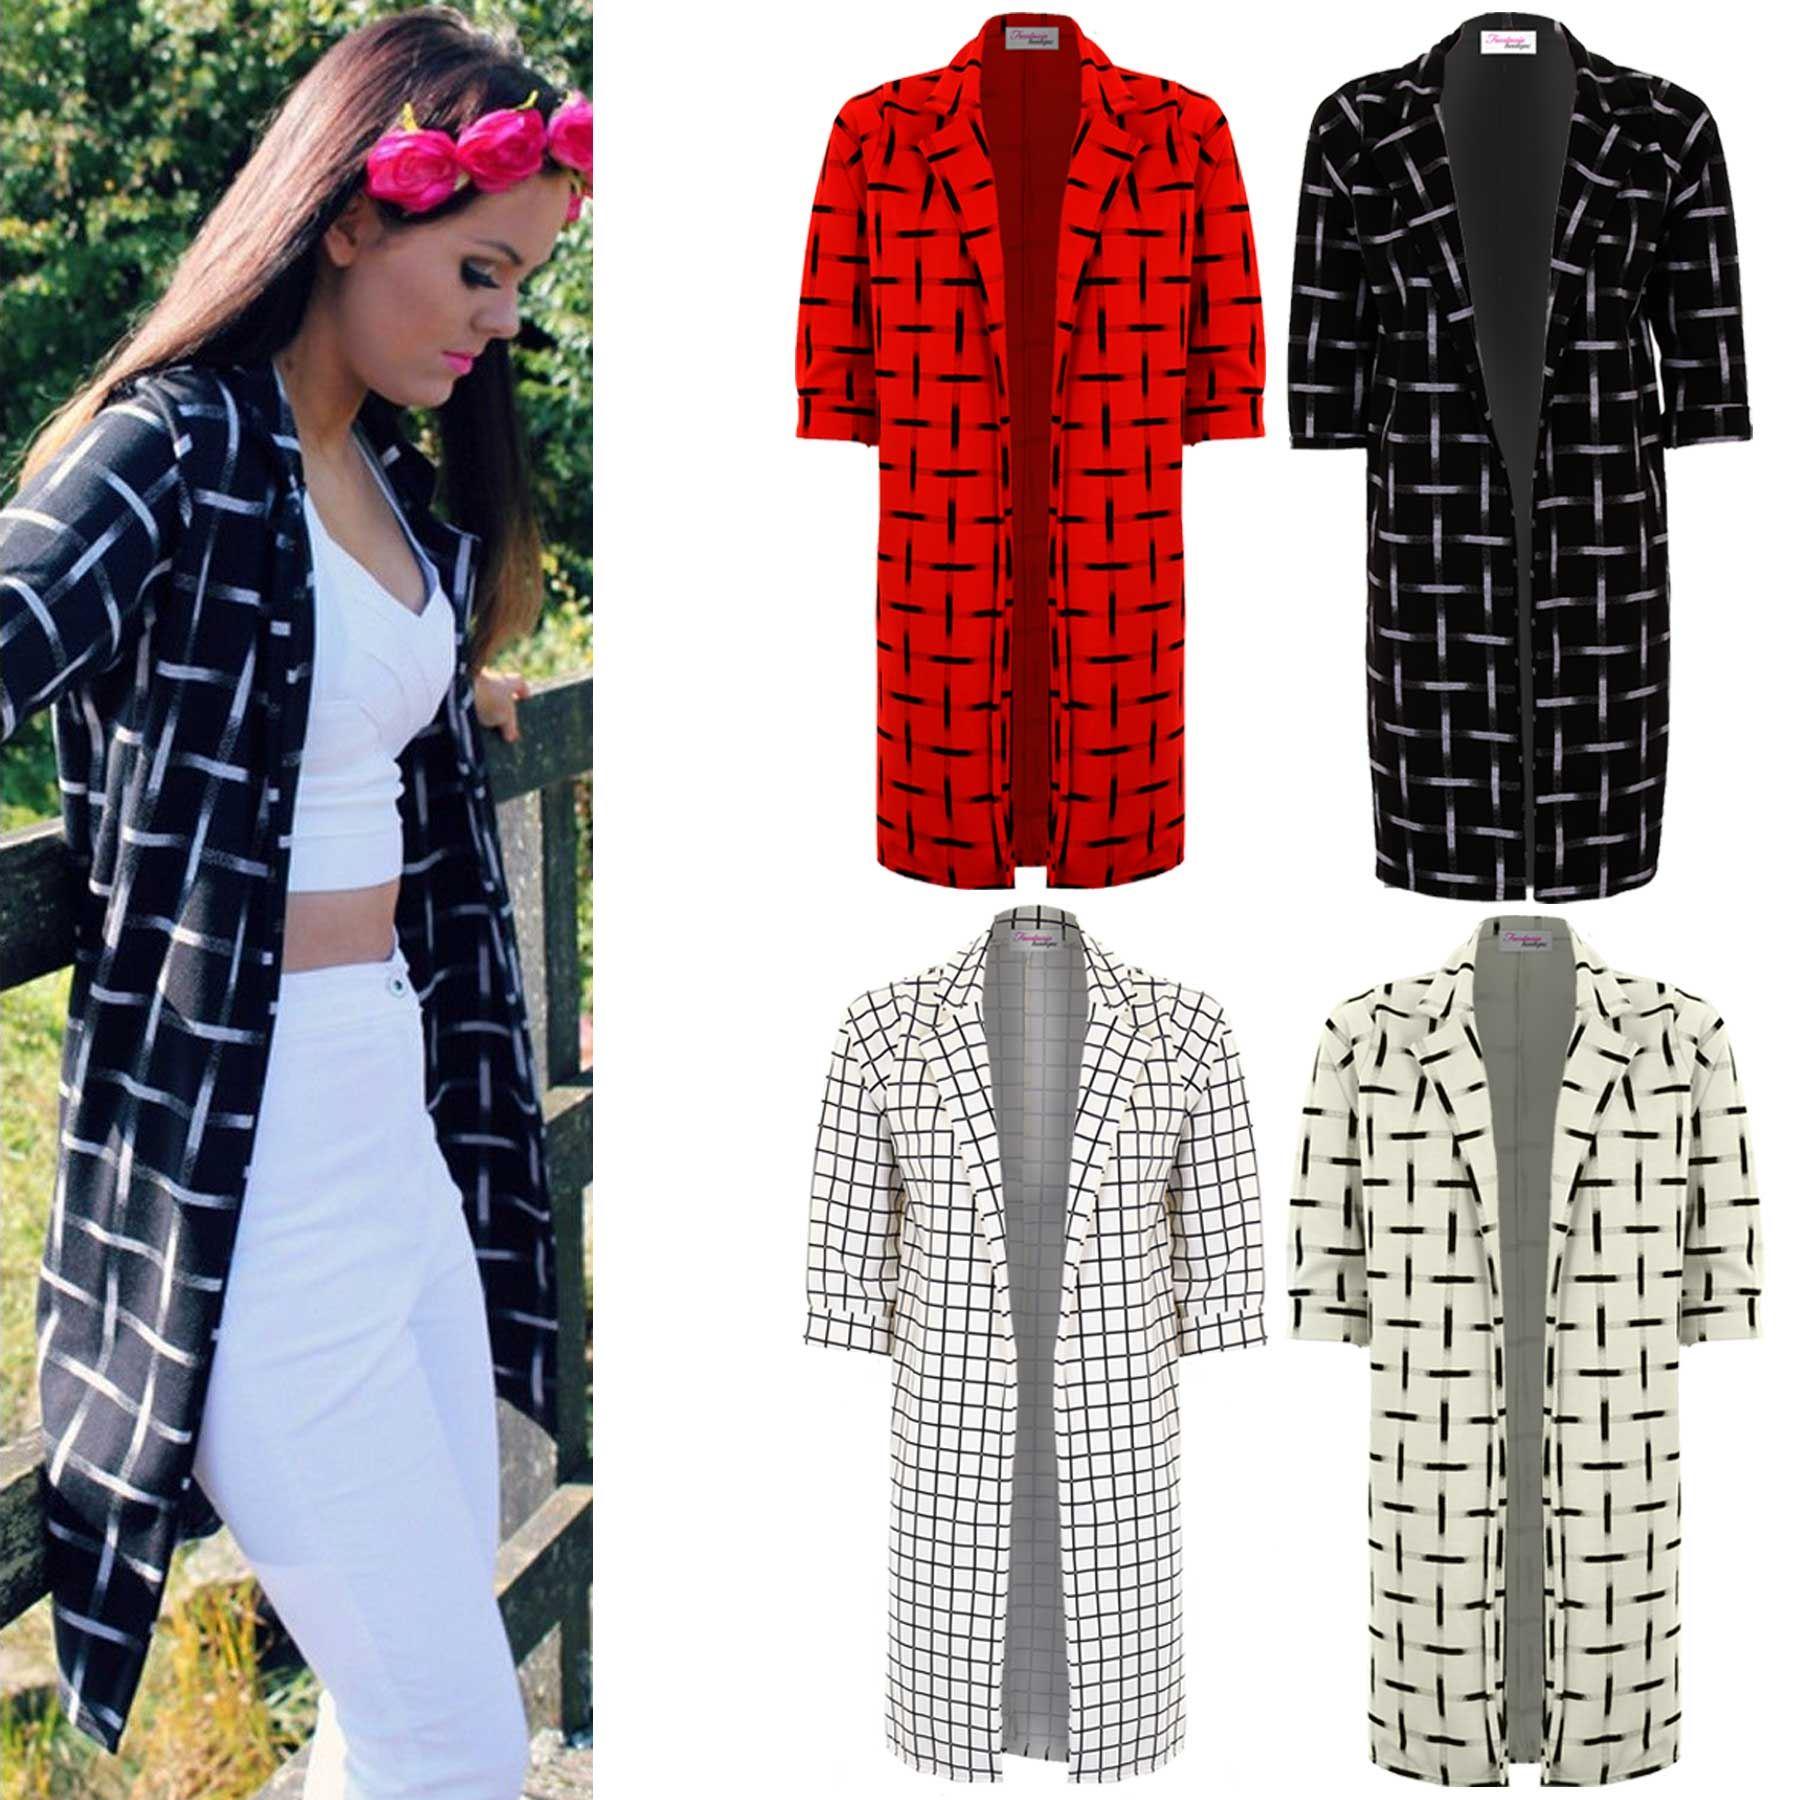 Ladies Checked Check Long Boyfriend Blazer Women's Suit Jacket Coat Trousers Coats, Jackets & Vests Clothing, Shoes & Accessories